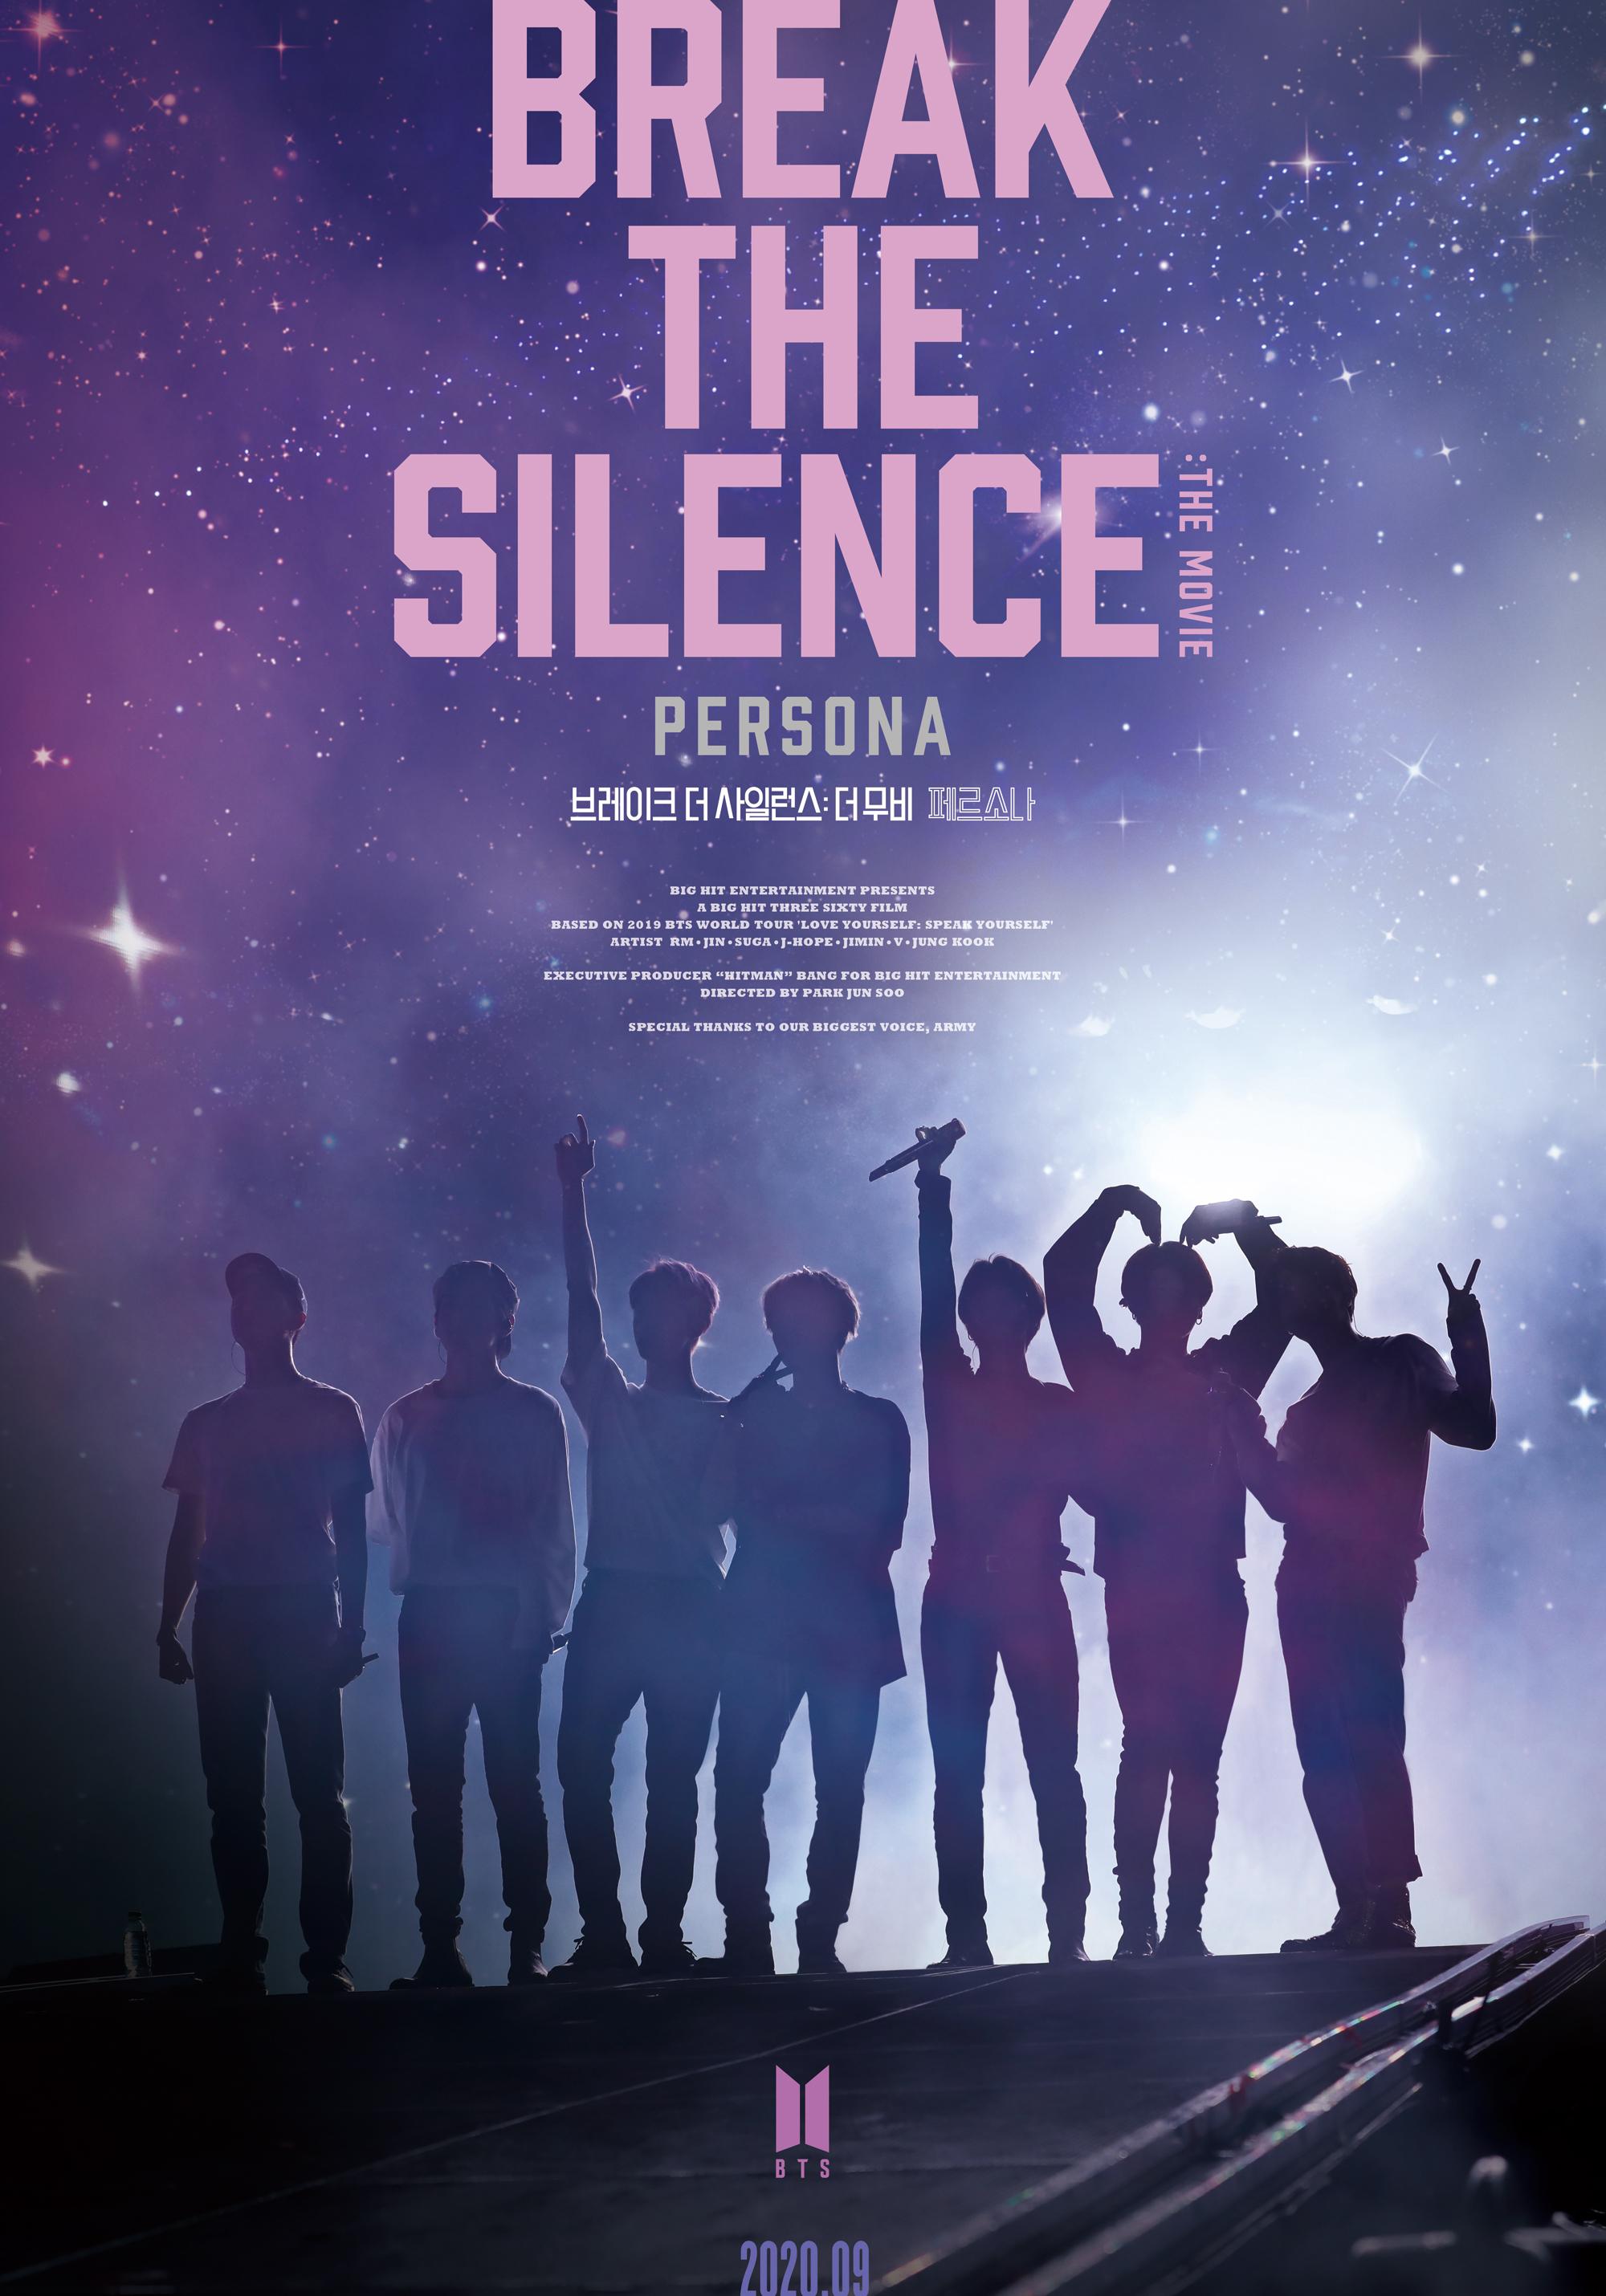 Break The Silence The Movie Bts Wiki Fandom